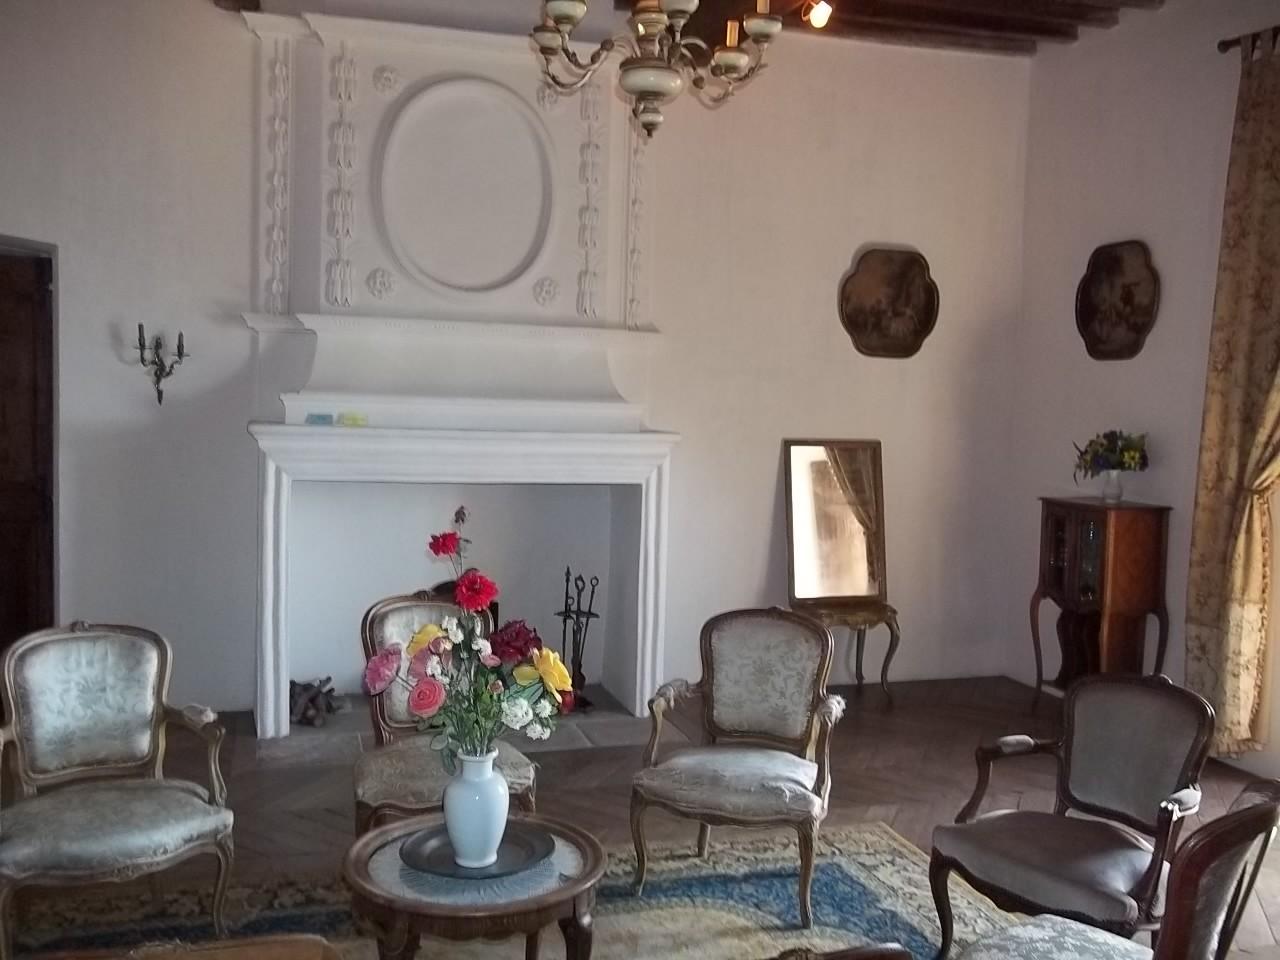 Der stuckverzierte Raum aus dem 17. Jahrhundert